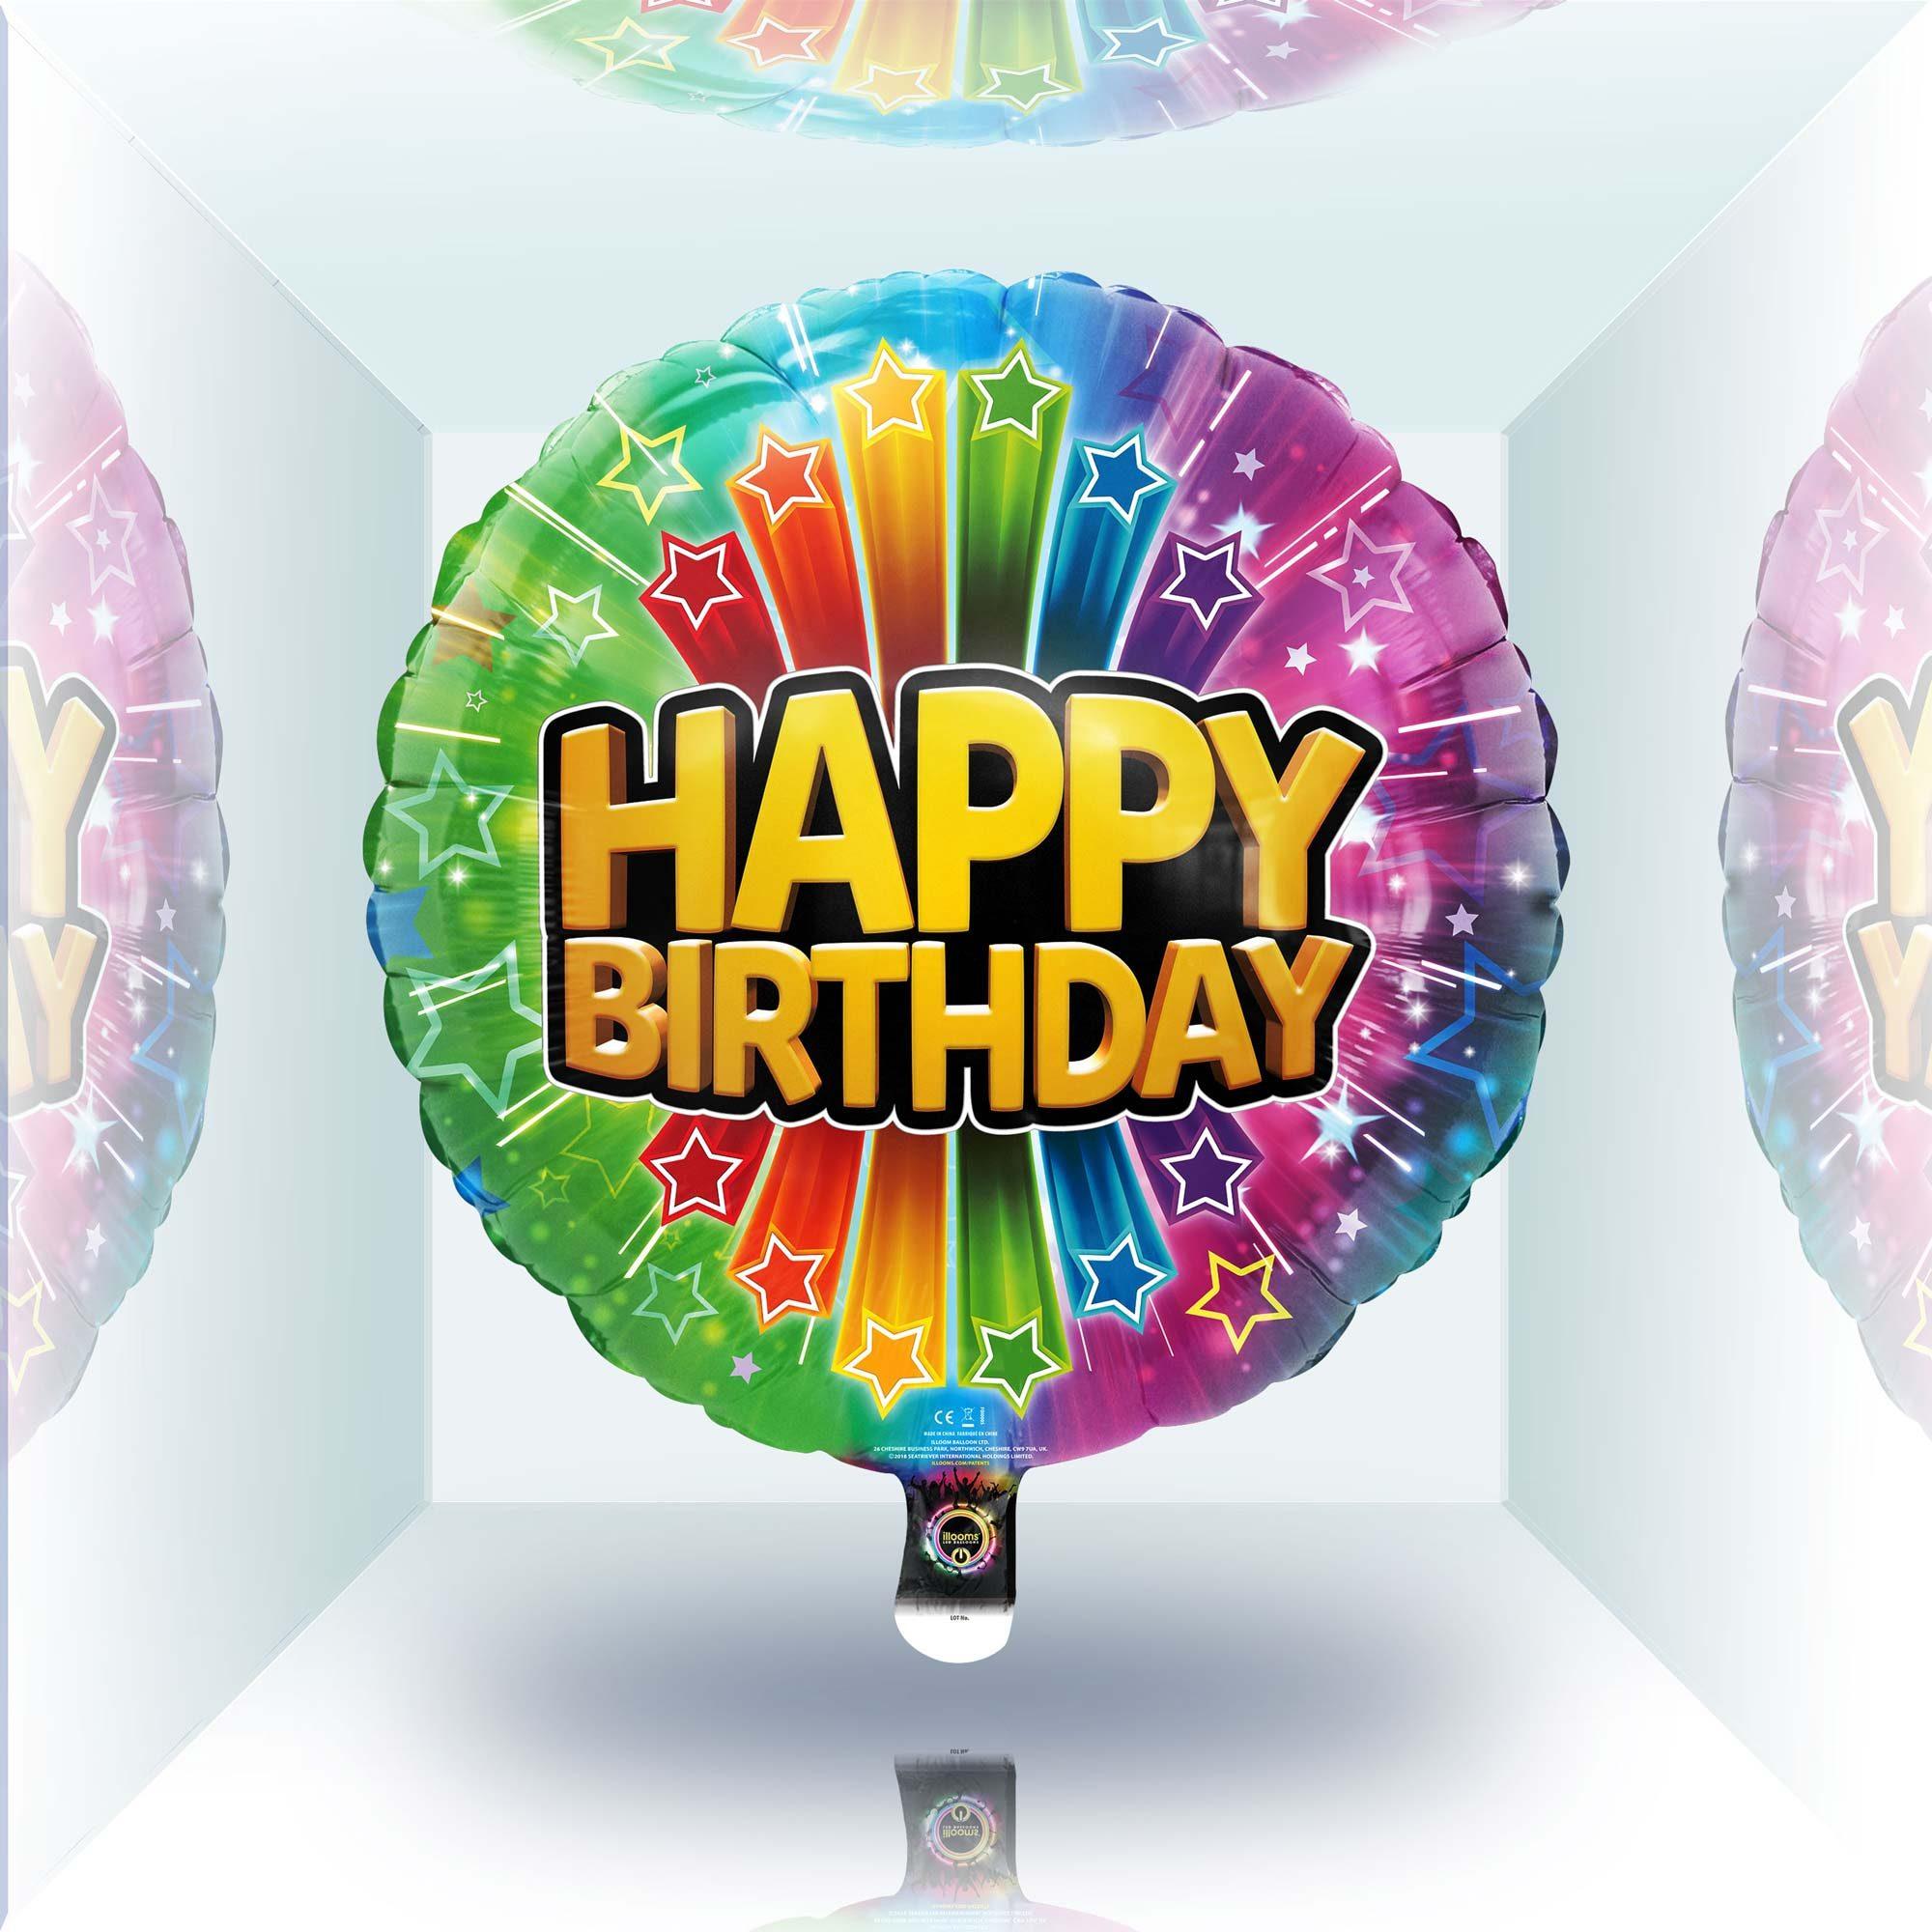 Happy Birthday Balloon in Daylight